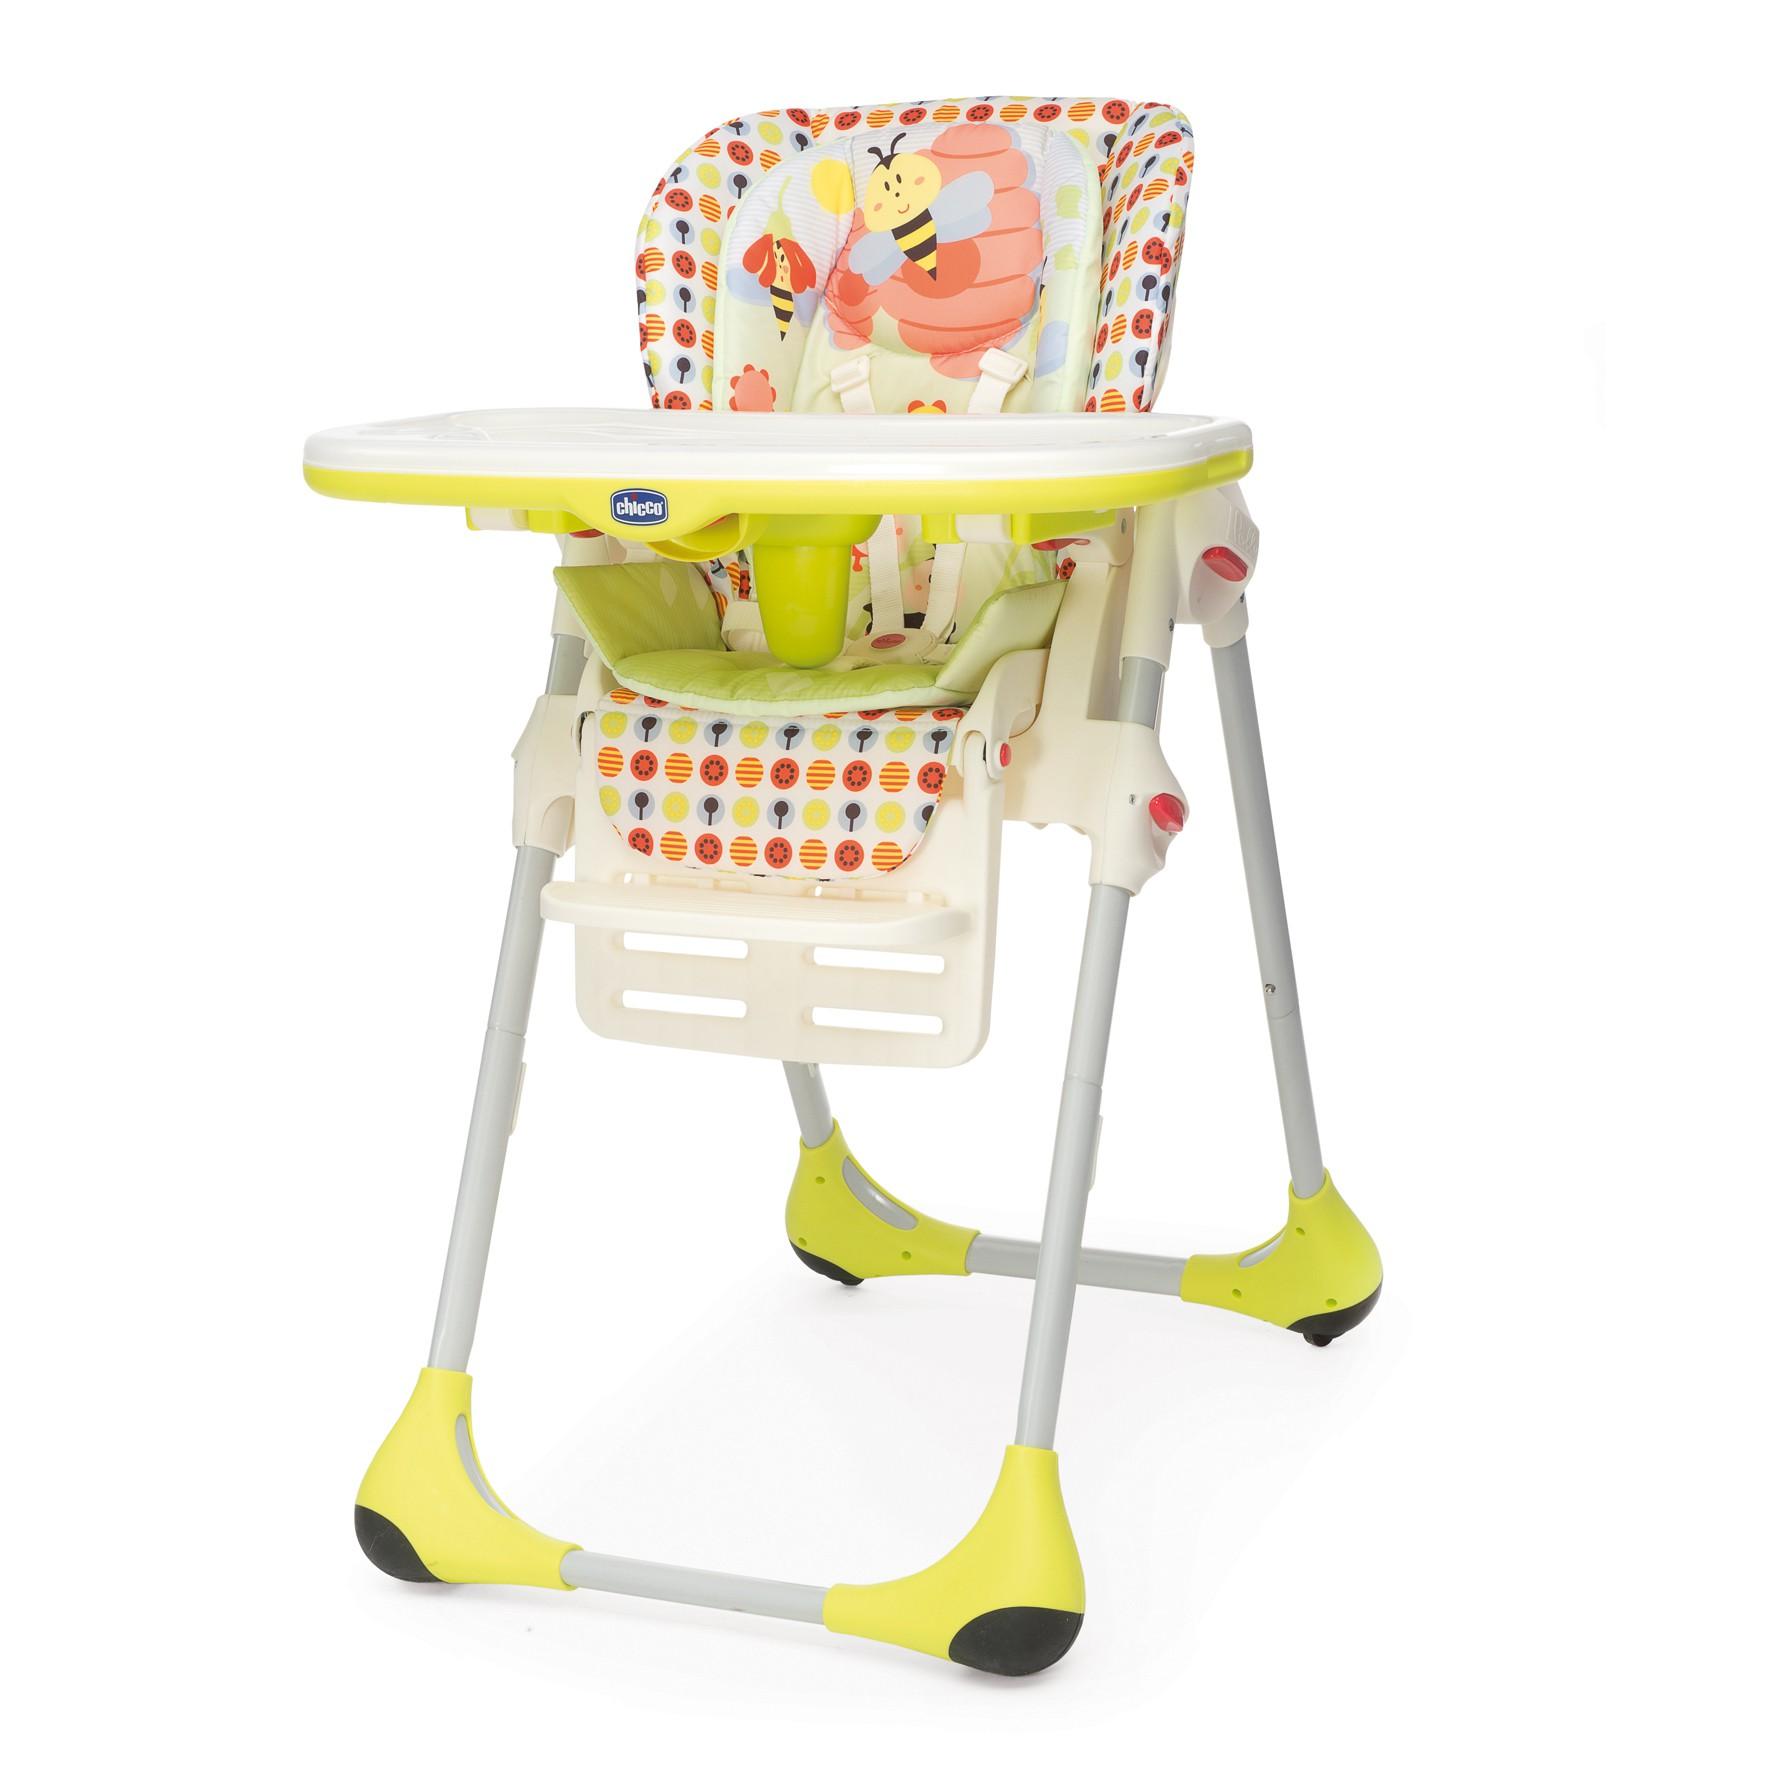 Chicco Polly Kinder-Hochstuhl 2 in 1 Sunny